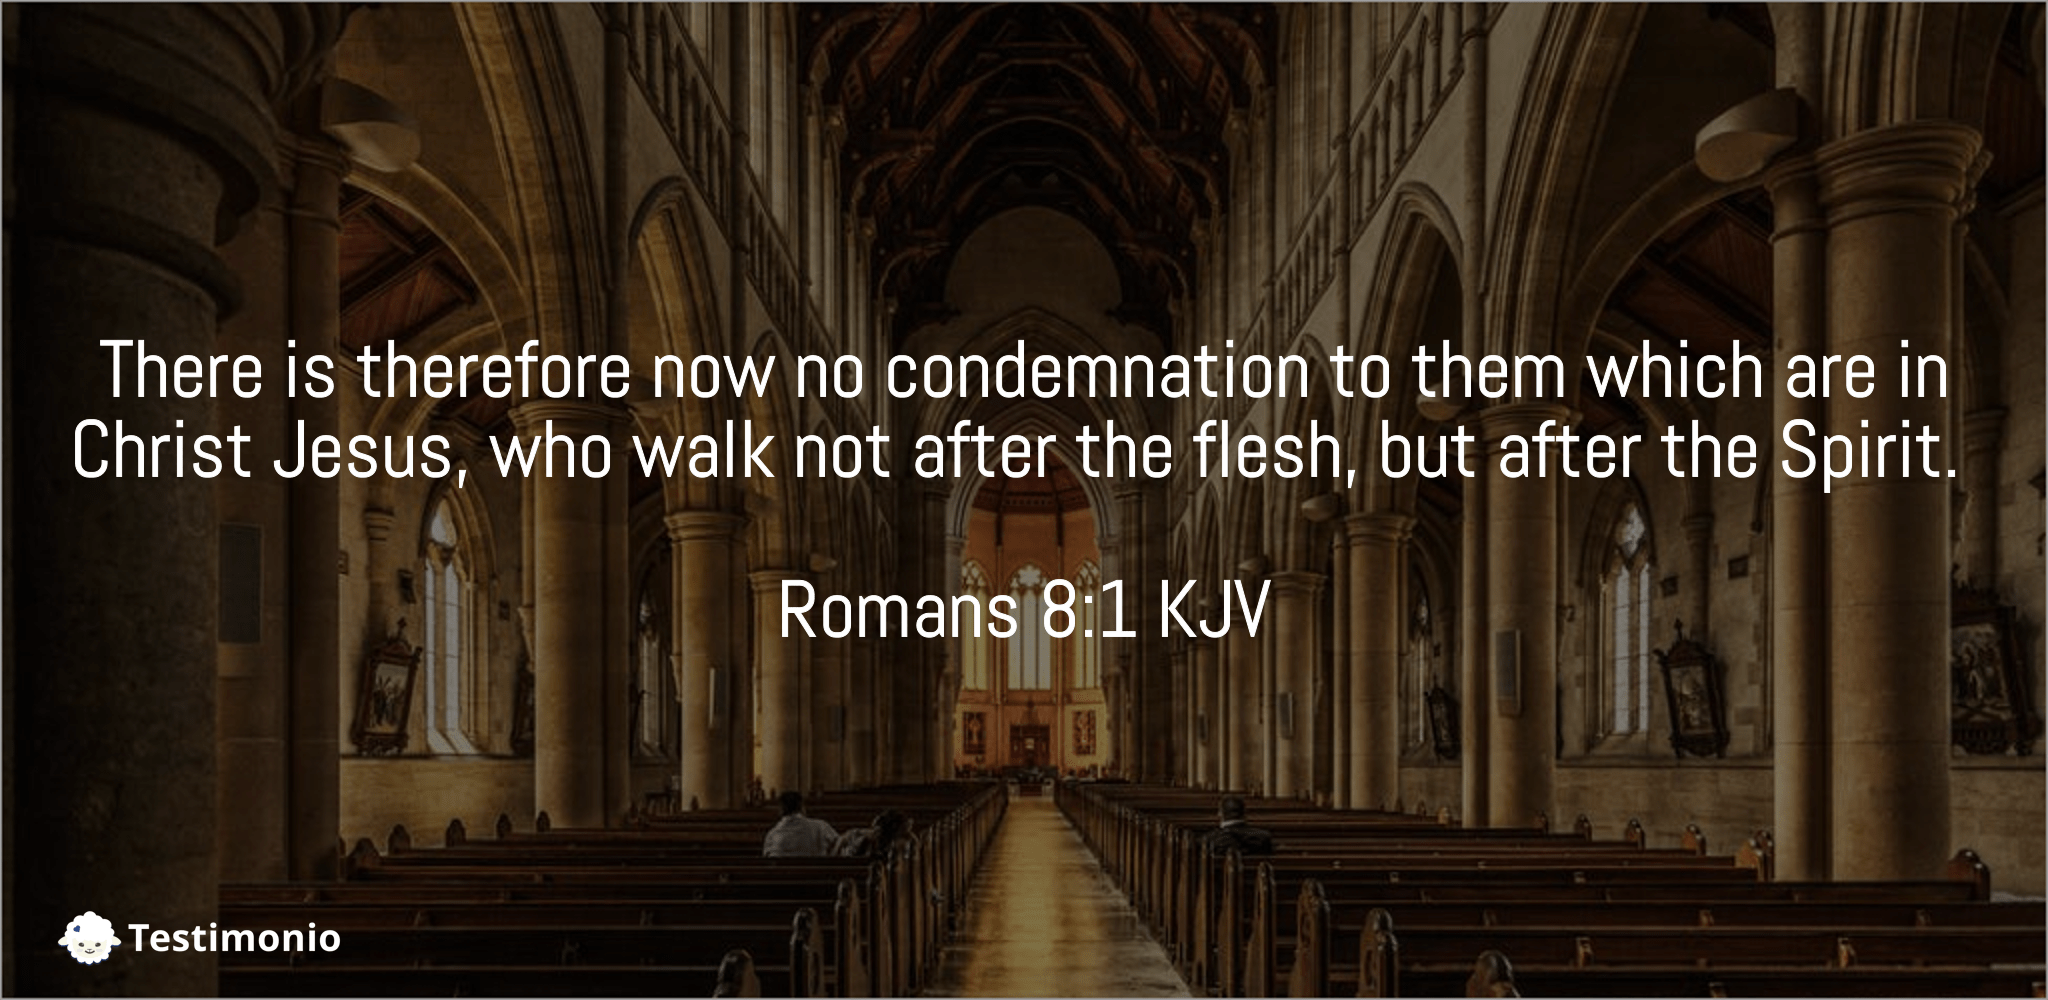 Romans 8:1